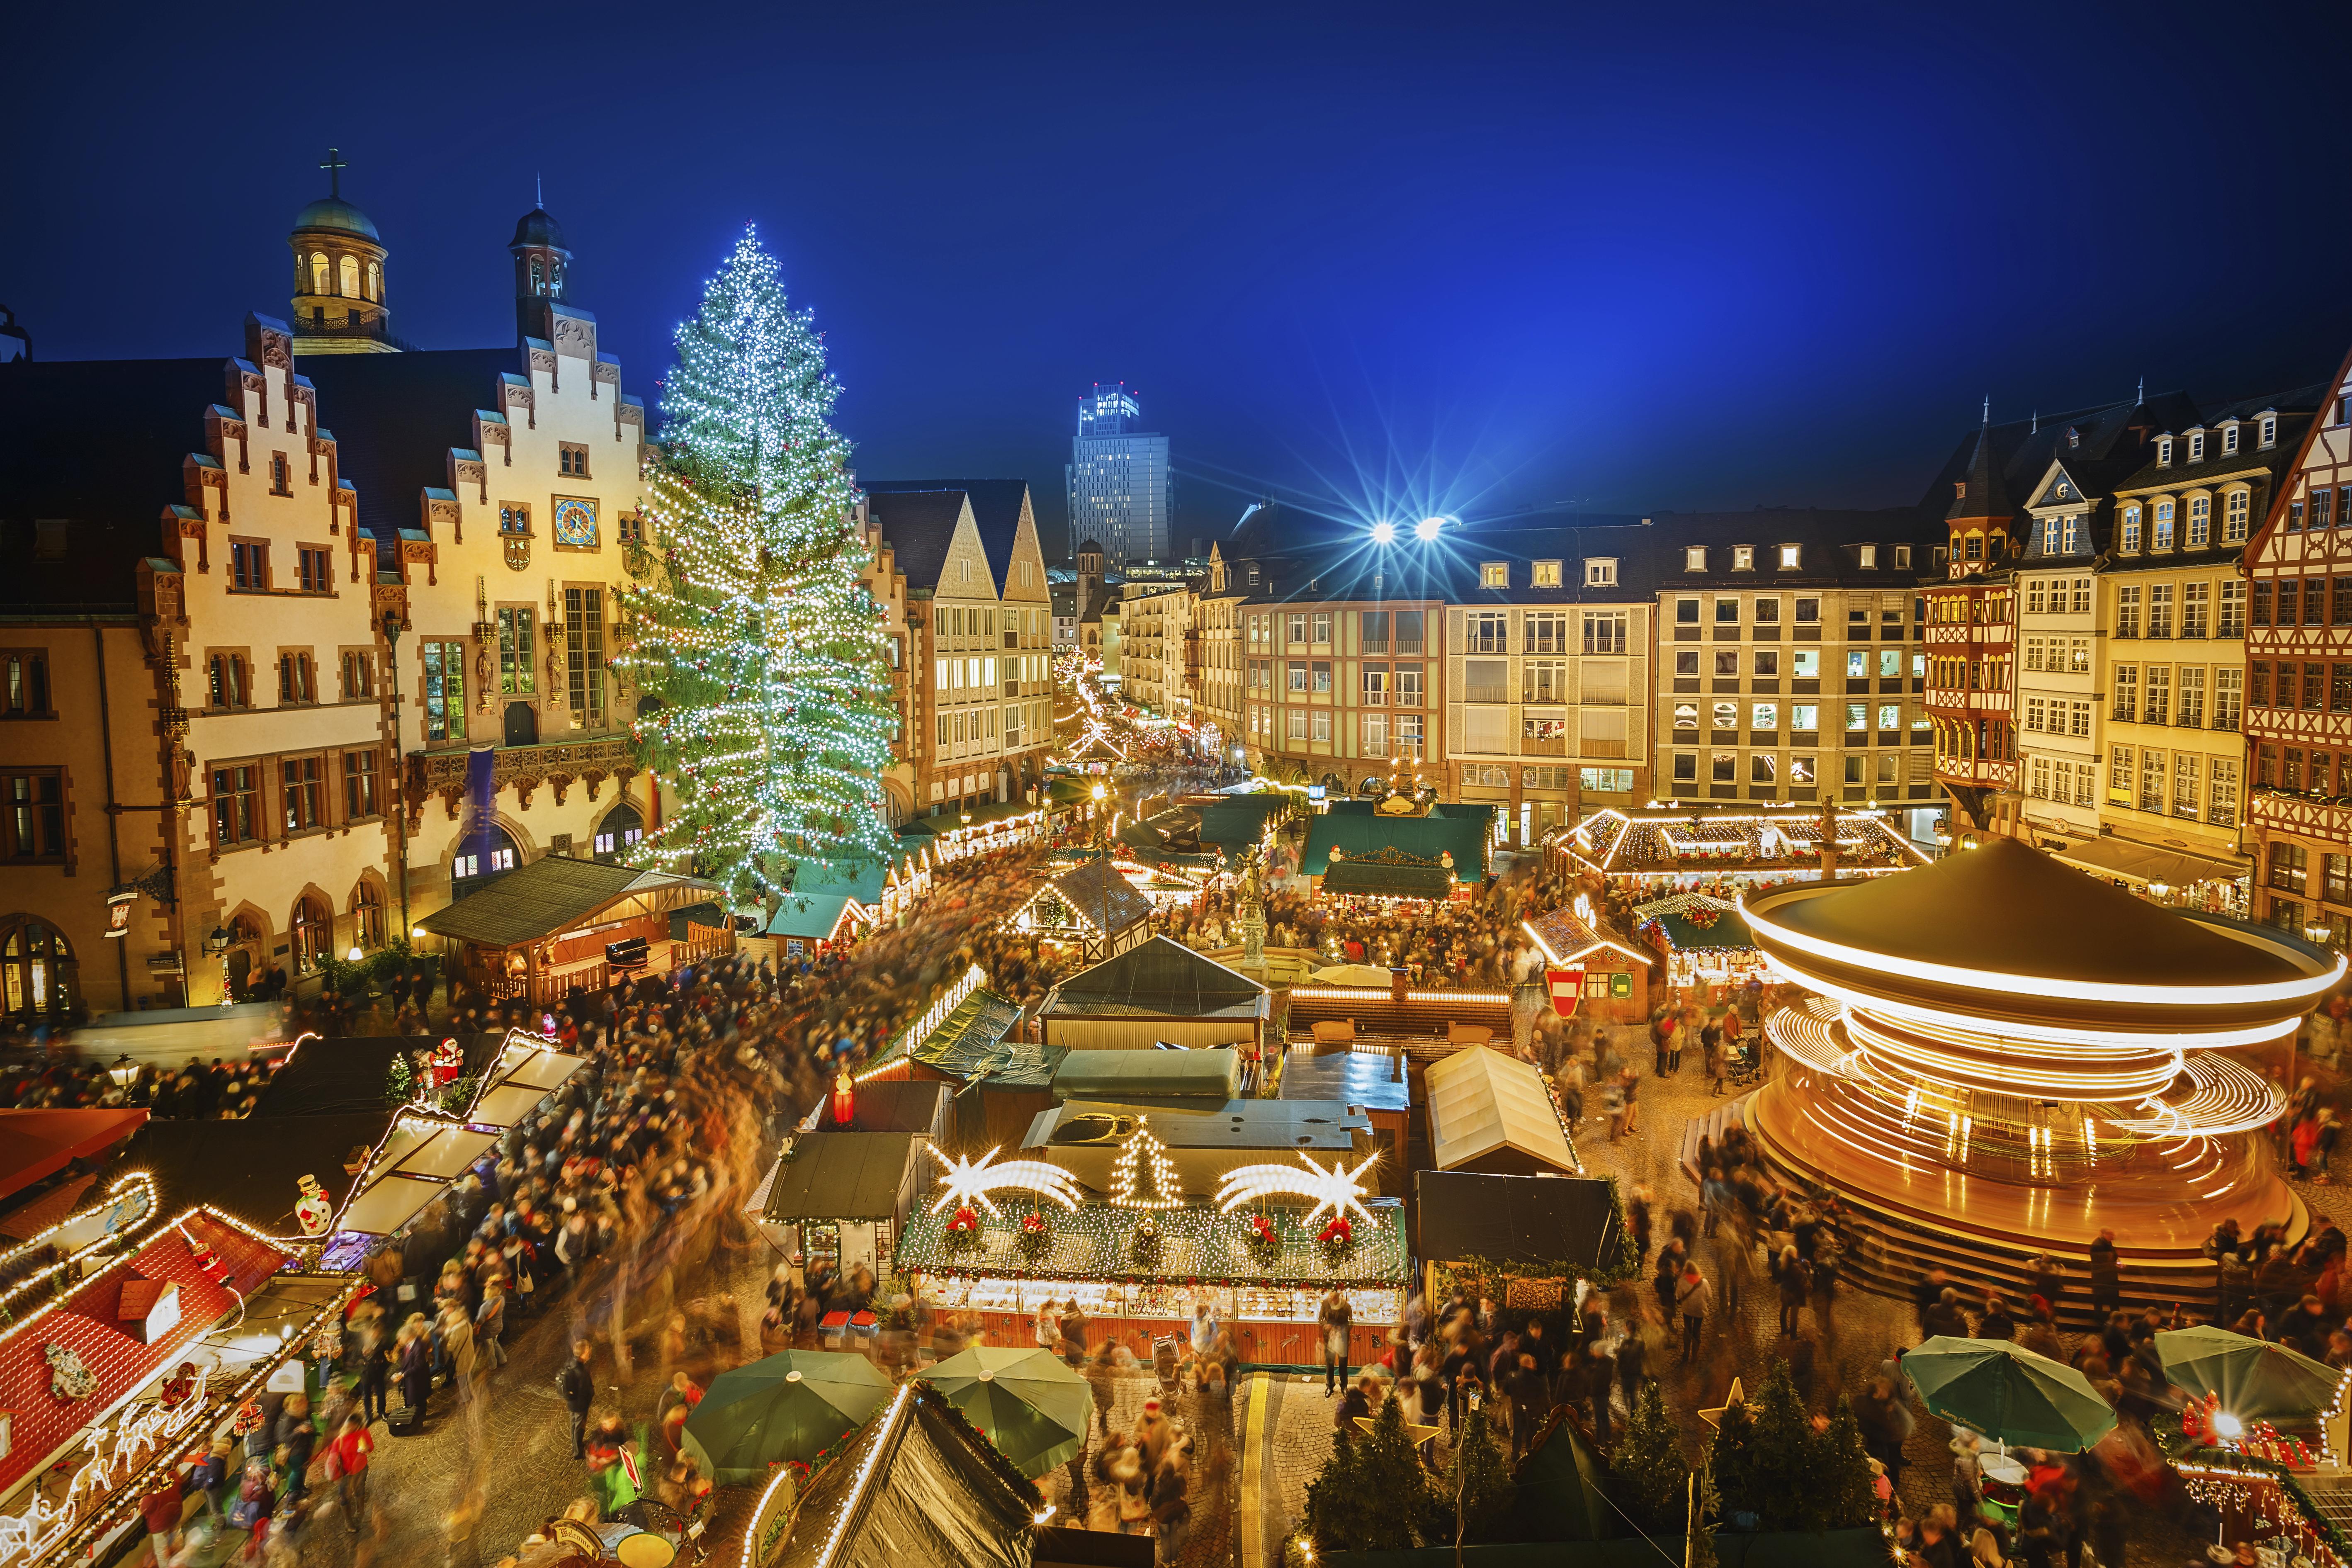 Paris Weihnachtsmarkt.11 Of The Best Christmas Market City Breaks For Under 80